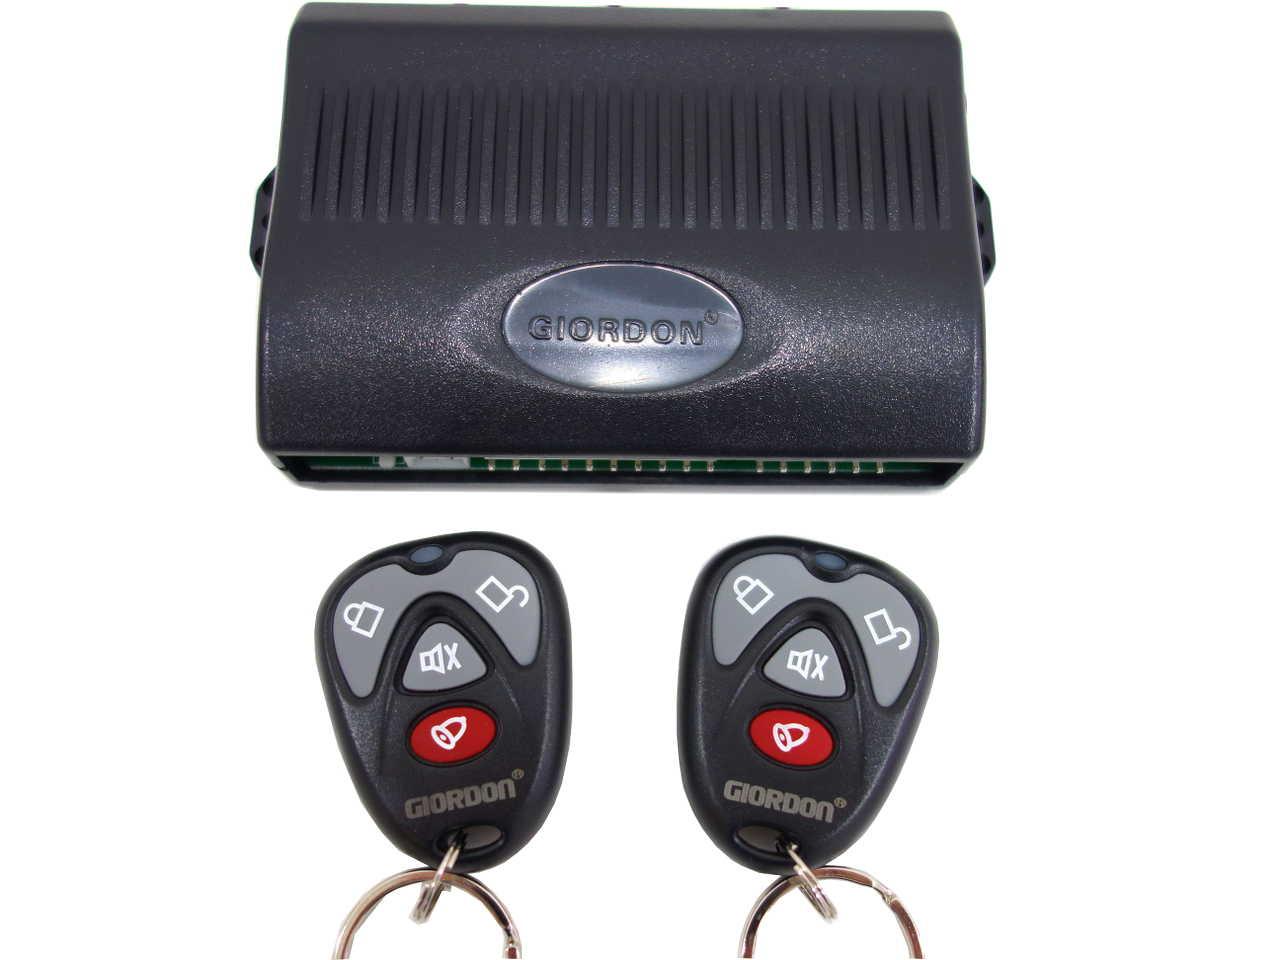 giordon car alarm system wiring diagram 1995 ford ranger wiper motor all diagrams 1985 chevy truck